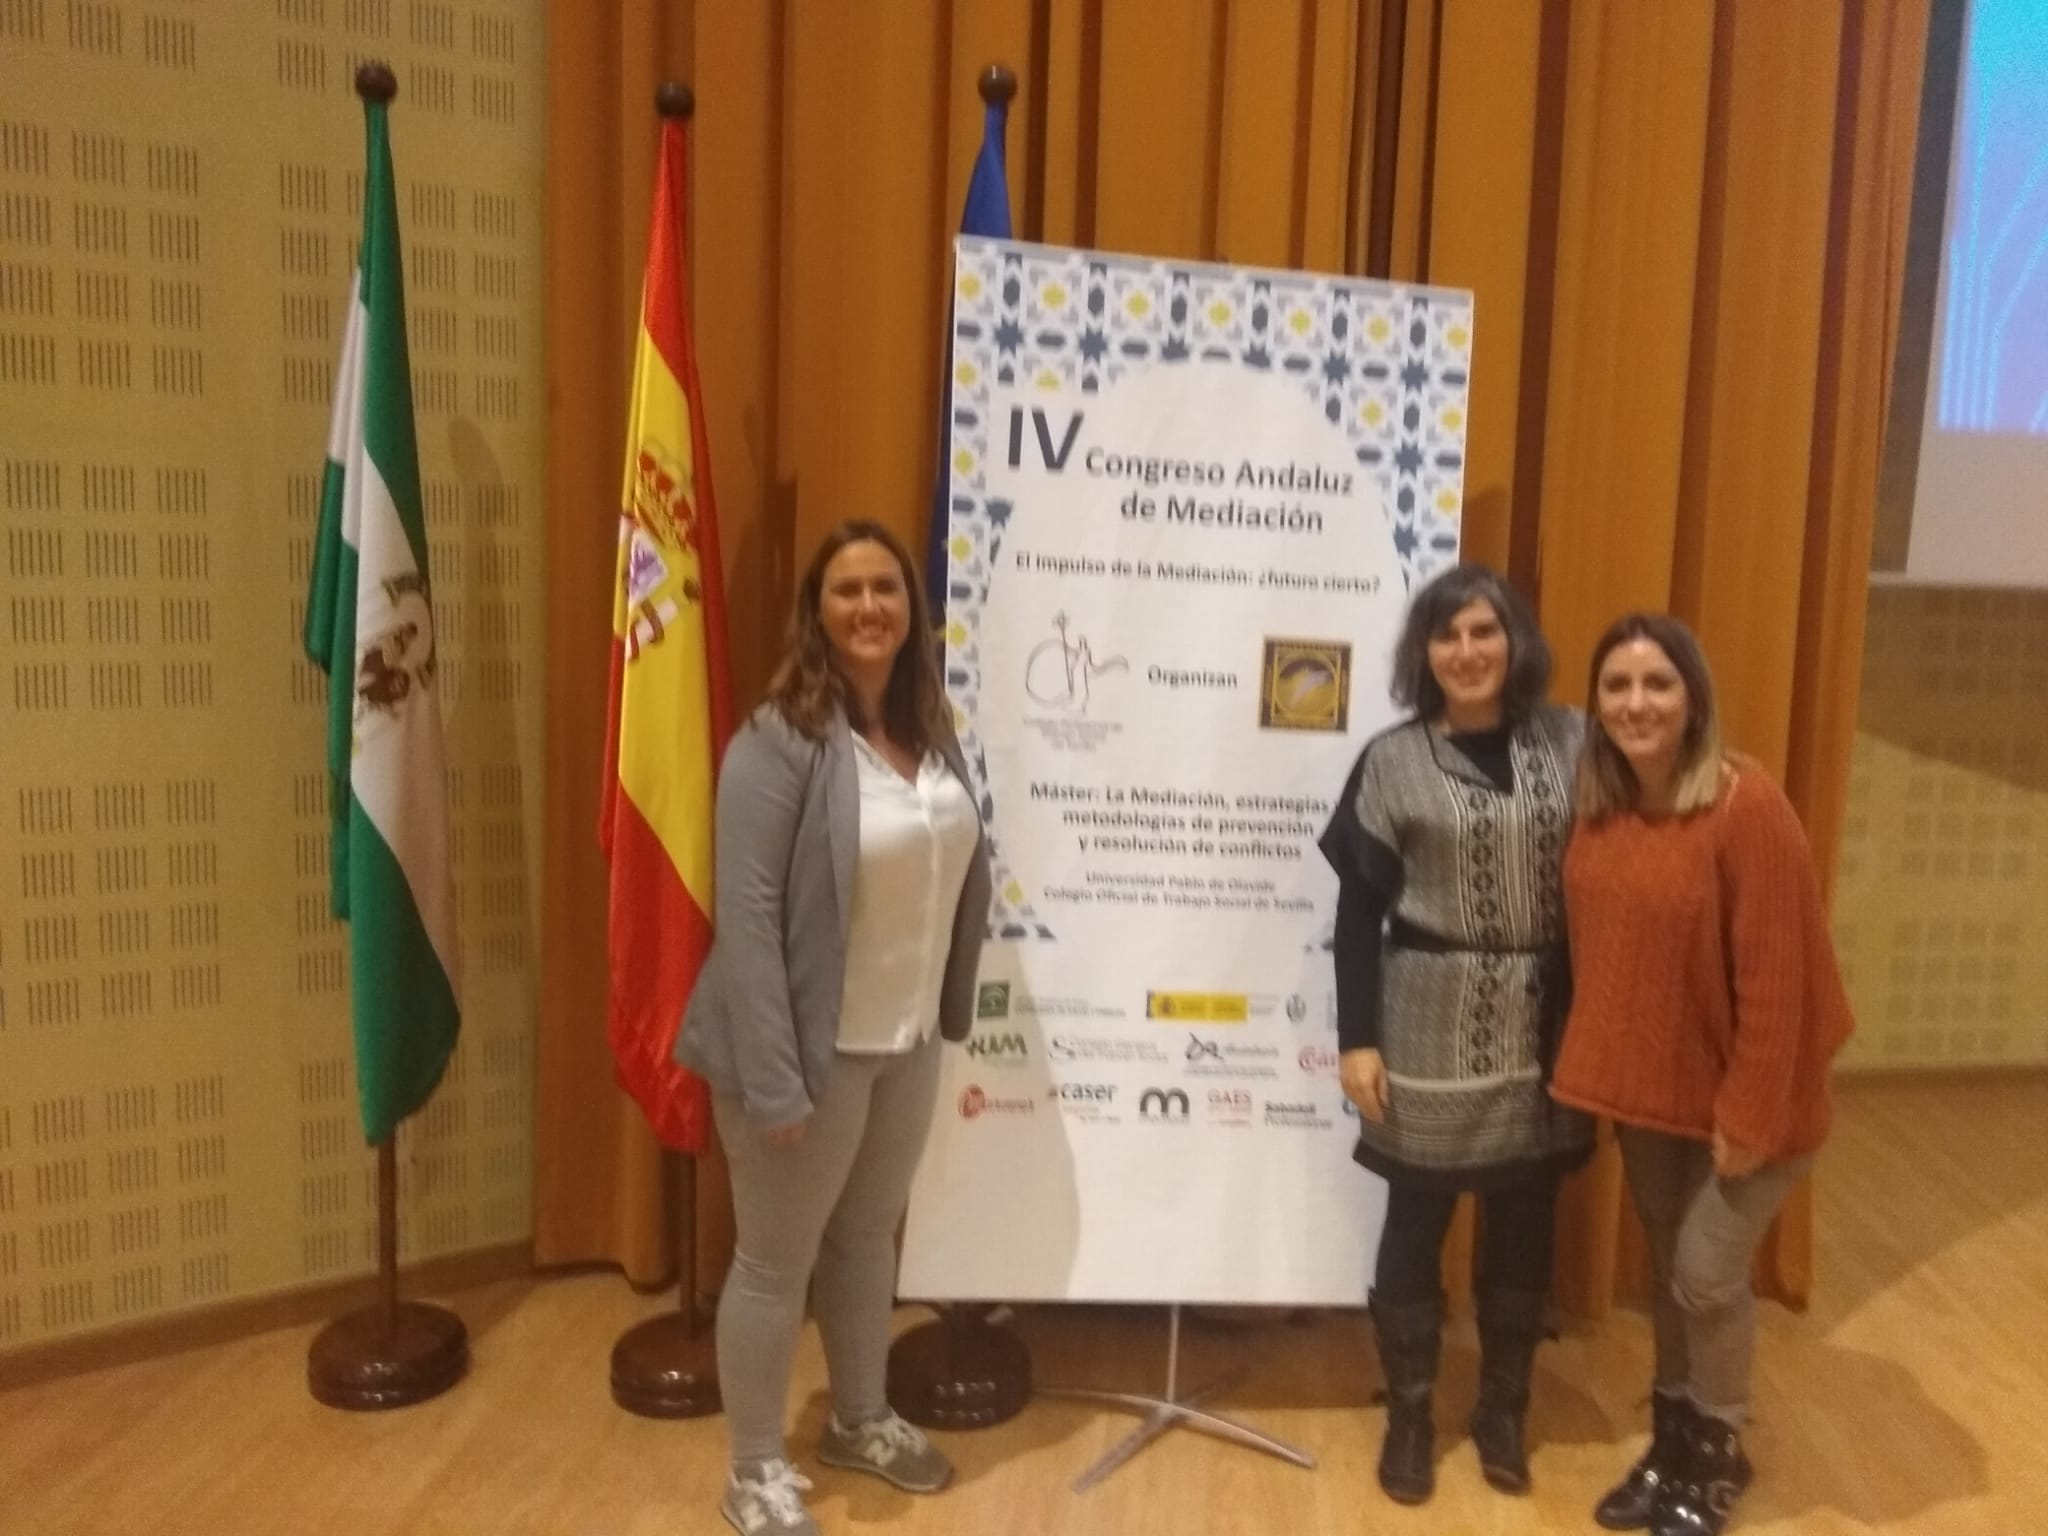 IV Congreso Andaluz de Medicacion